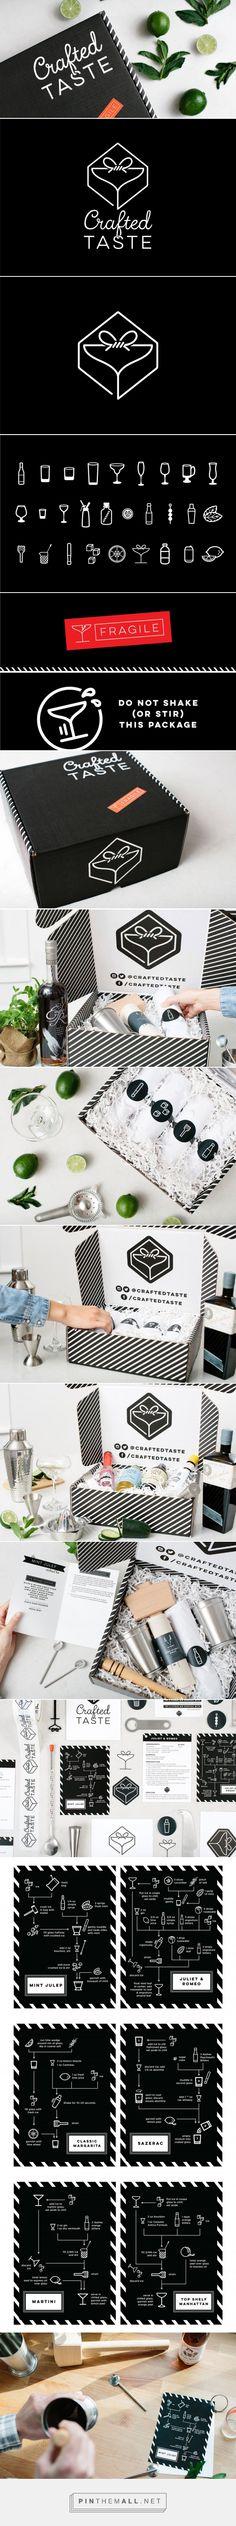 Crafted Taste — The Dieline - Branding